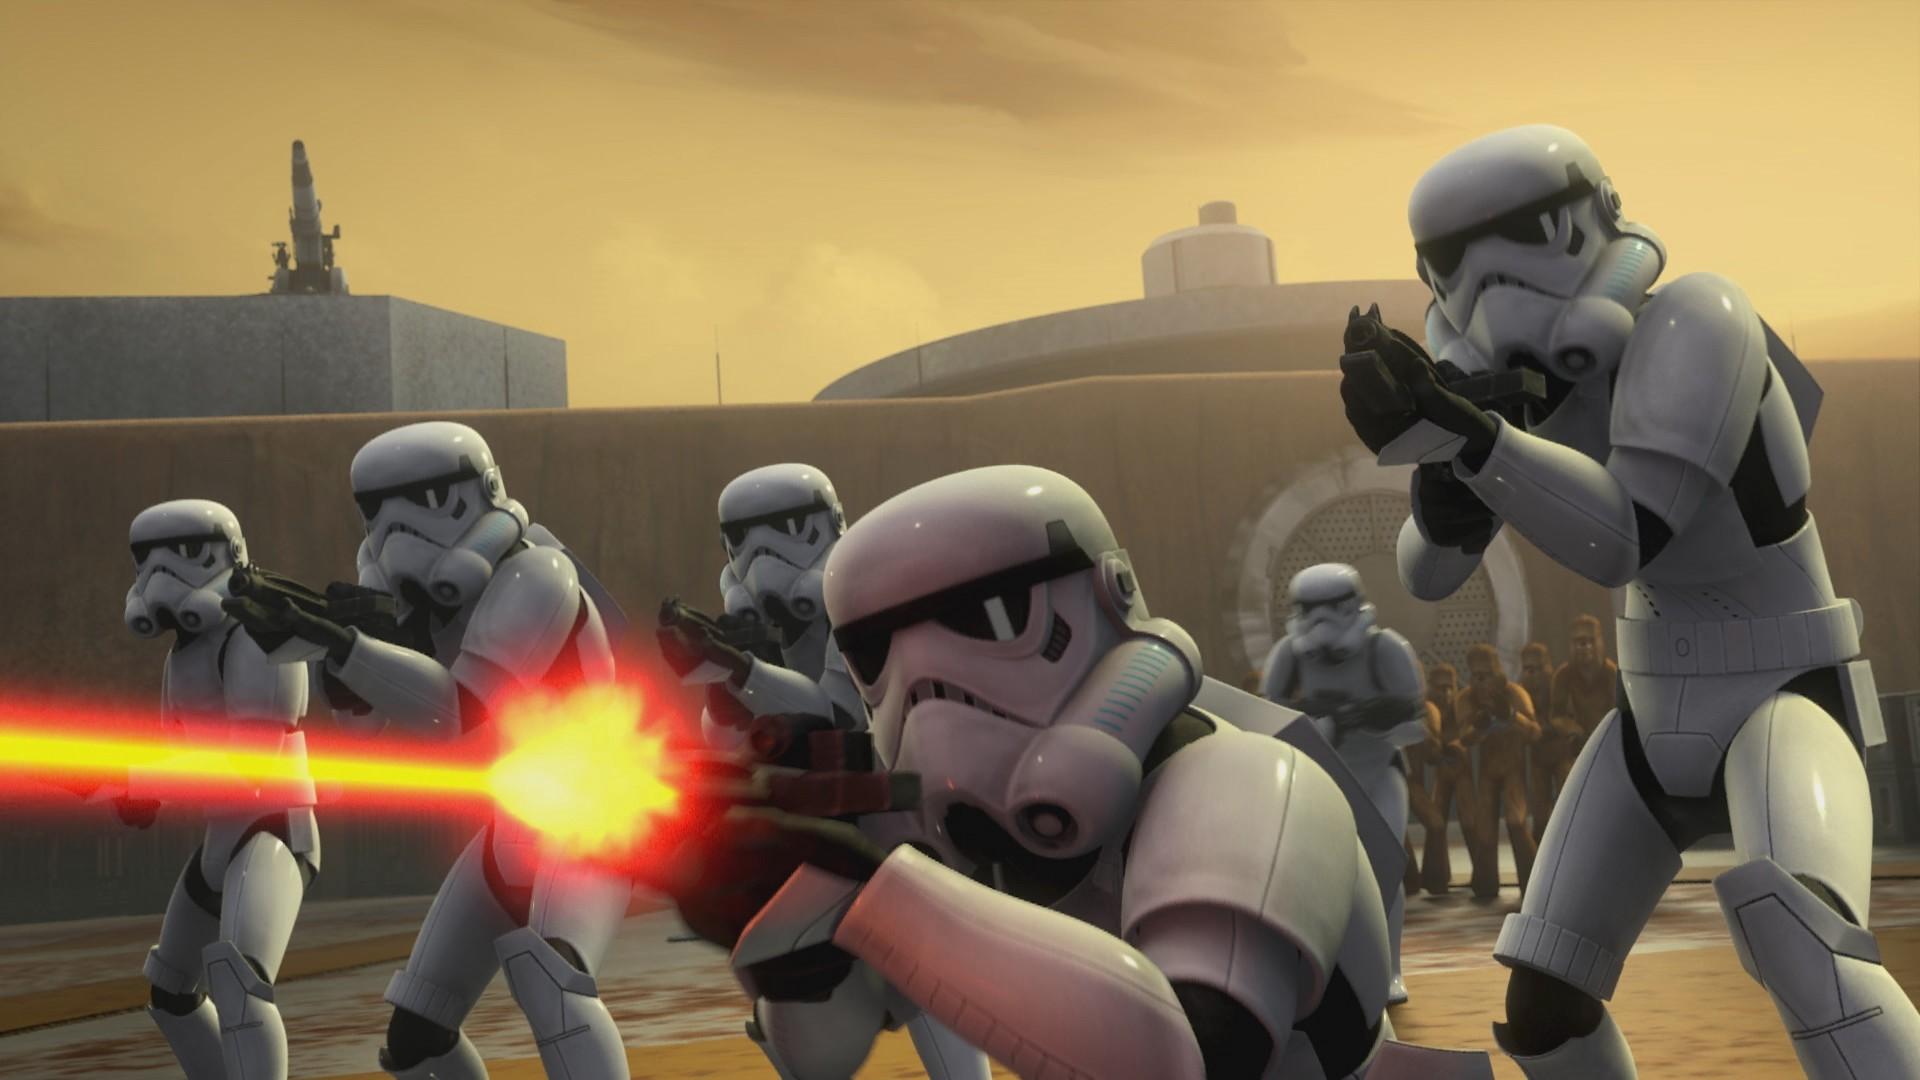 Image – Star-wars-rebels-trailer-stormtroopers.jpg | Star Wars Rebels Wiki  | FANDOM powered by Wikia